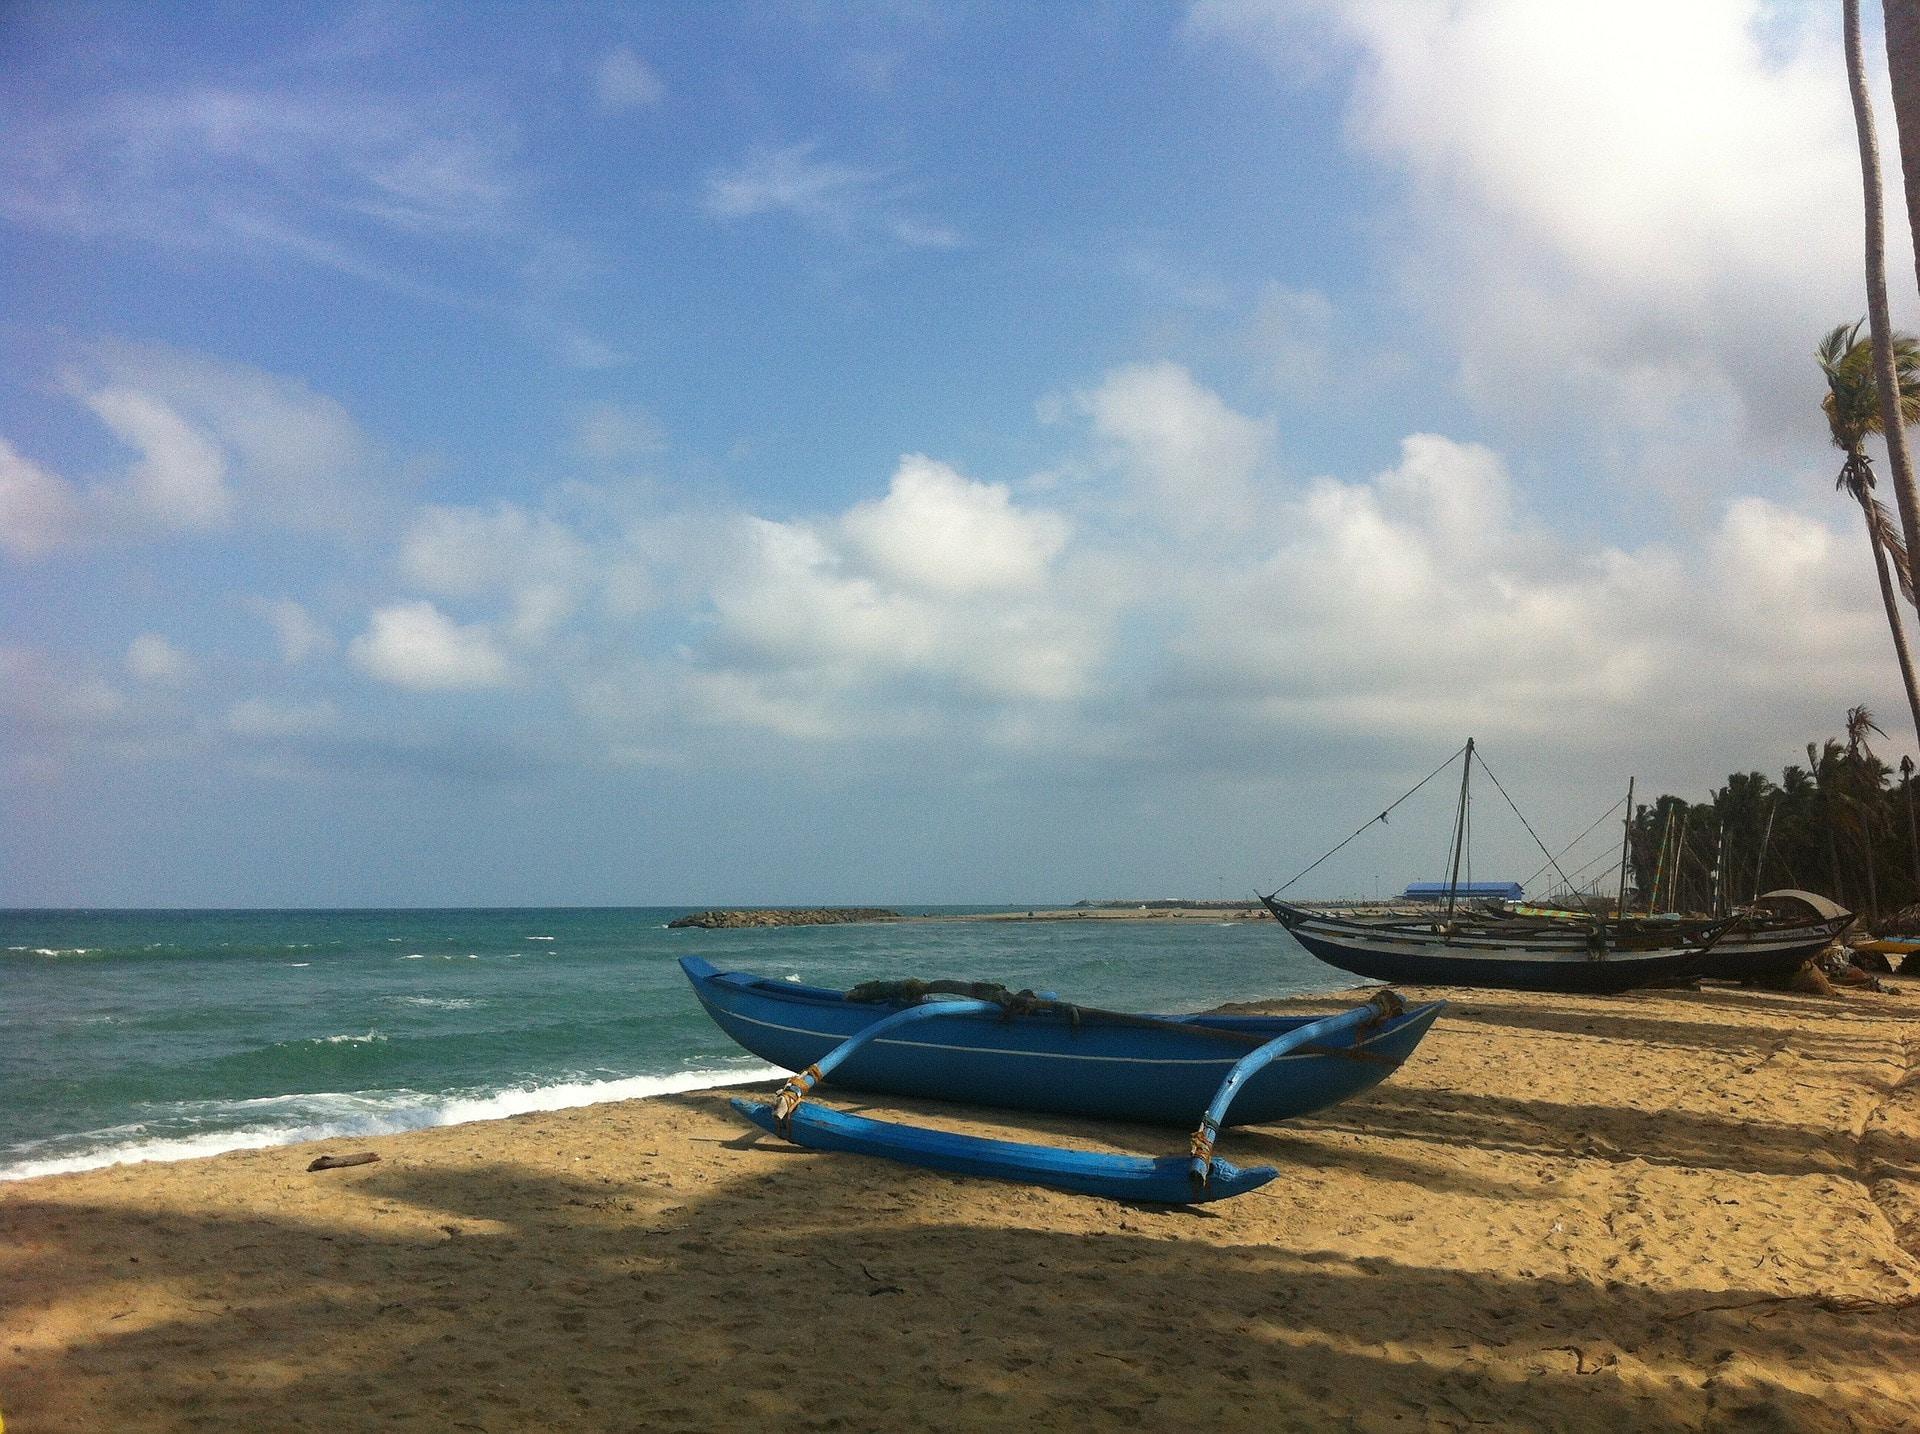 eastern-coastal-beach-176161_1920.jpg